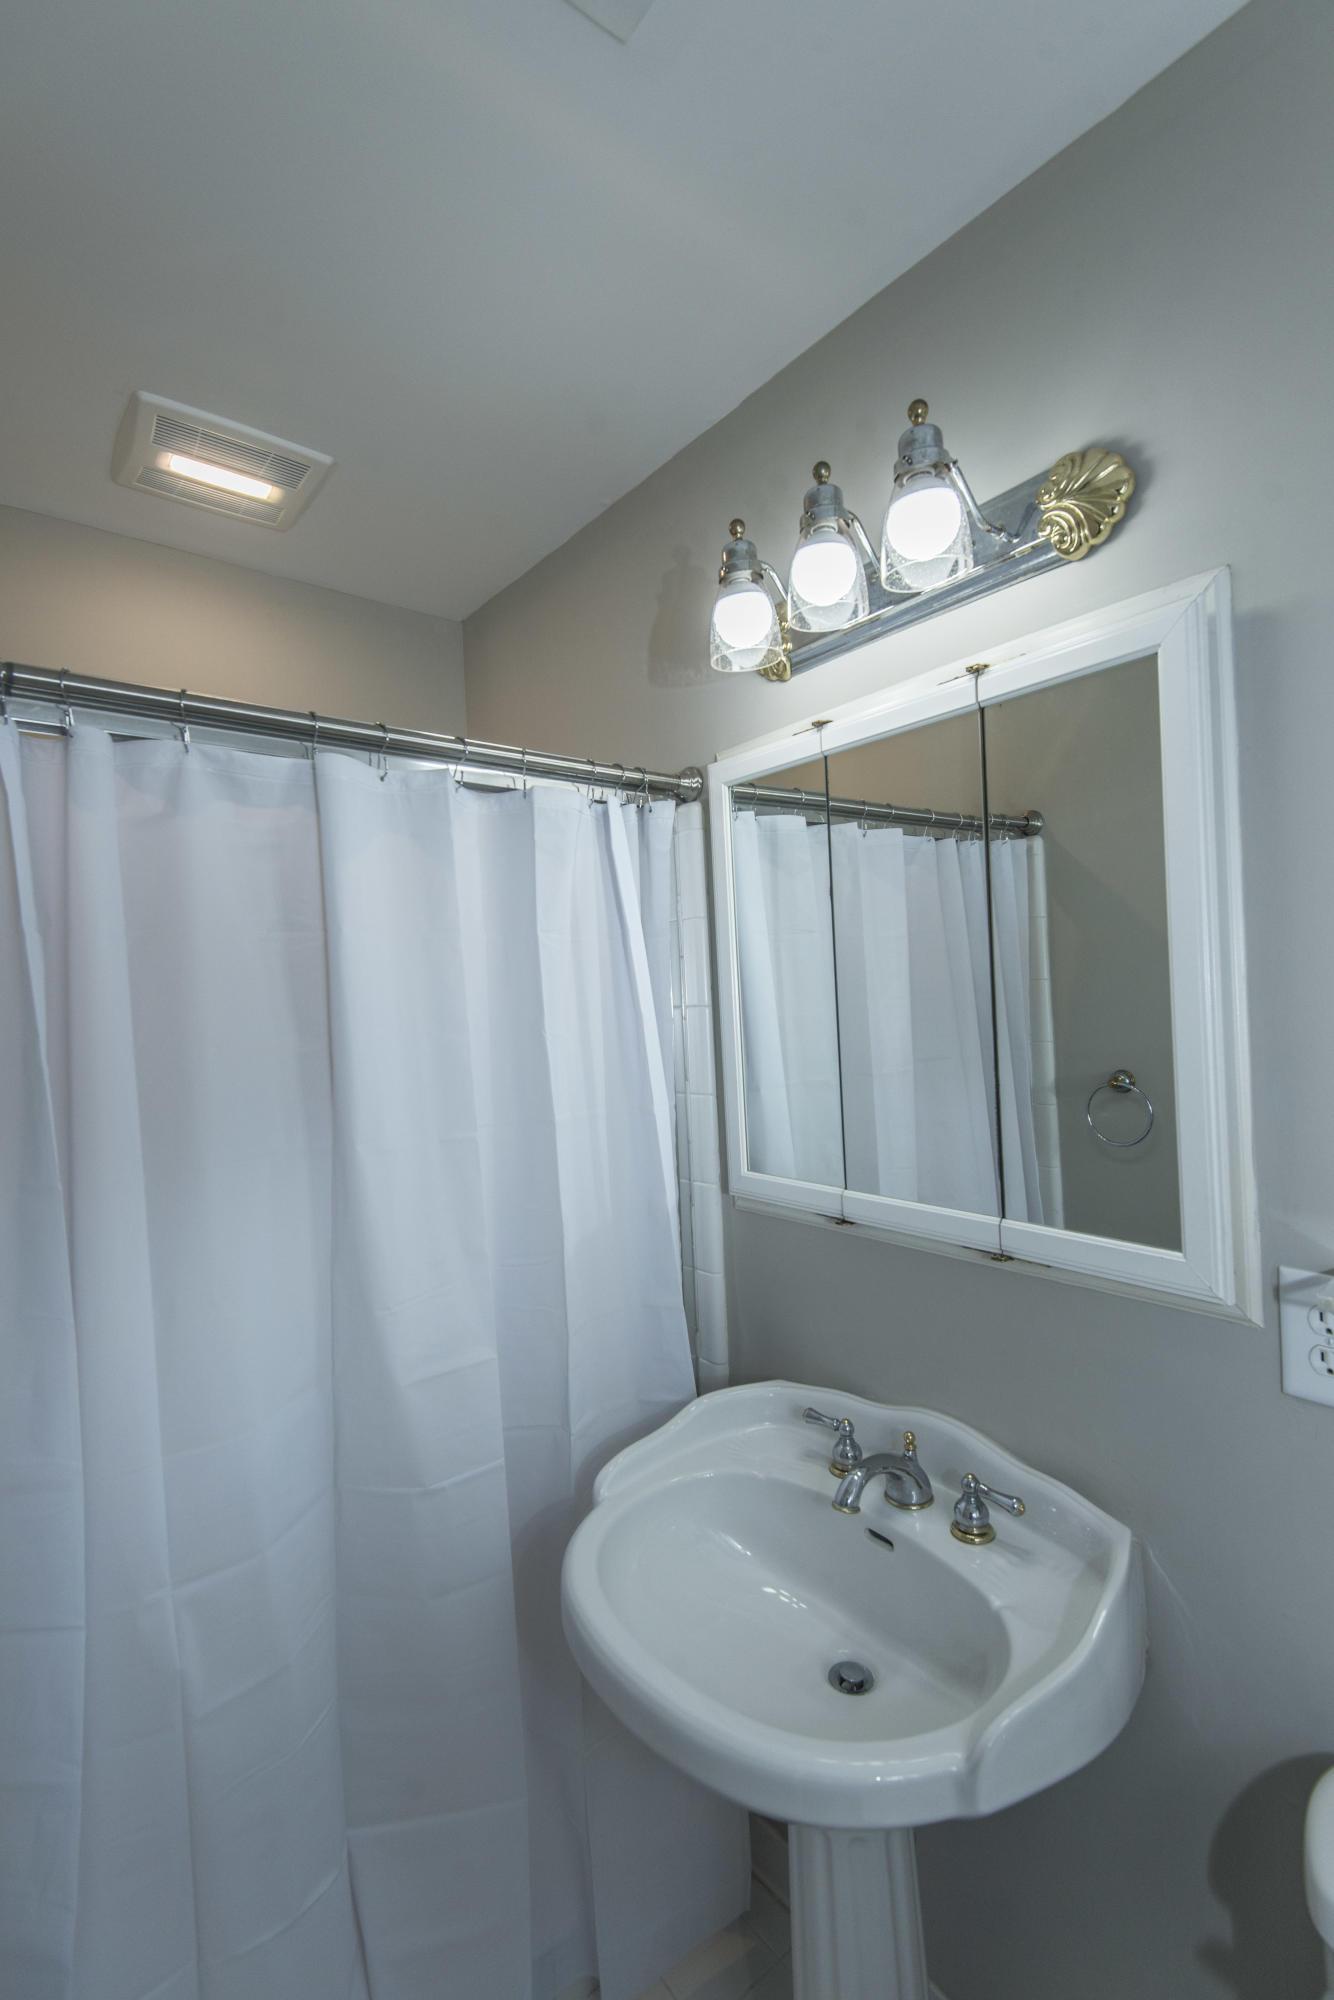 Rotherwood Estates Homes For Sale - 373 Wedgewood, Charleston, SC - 8